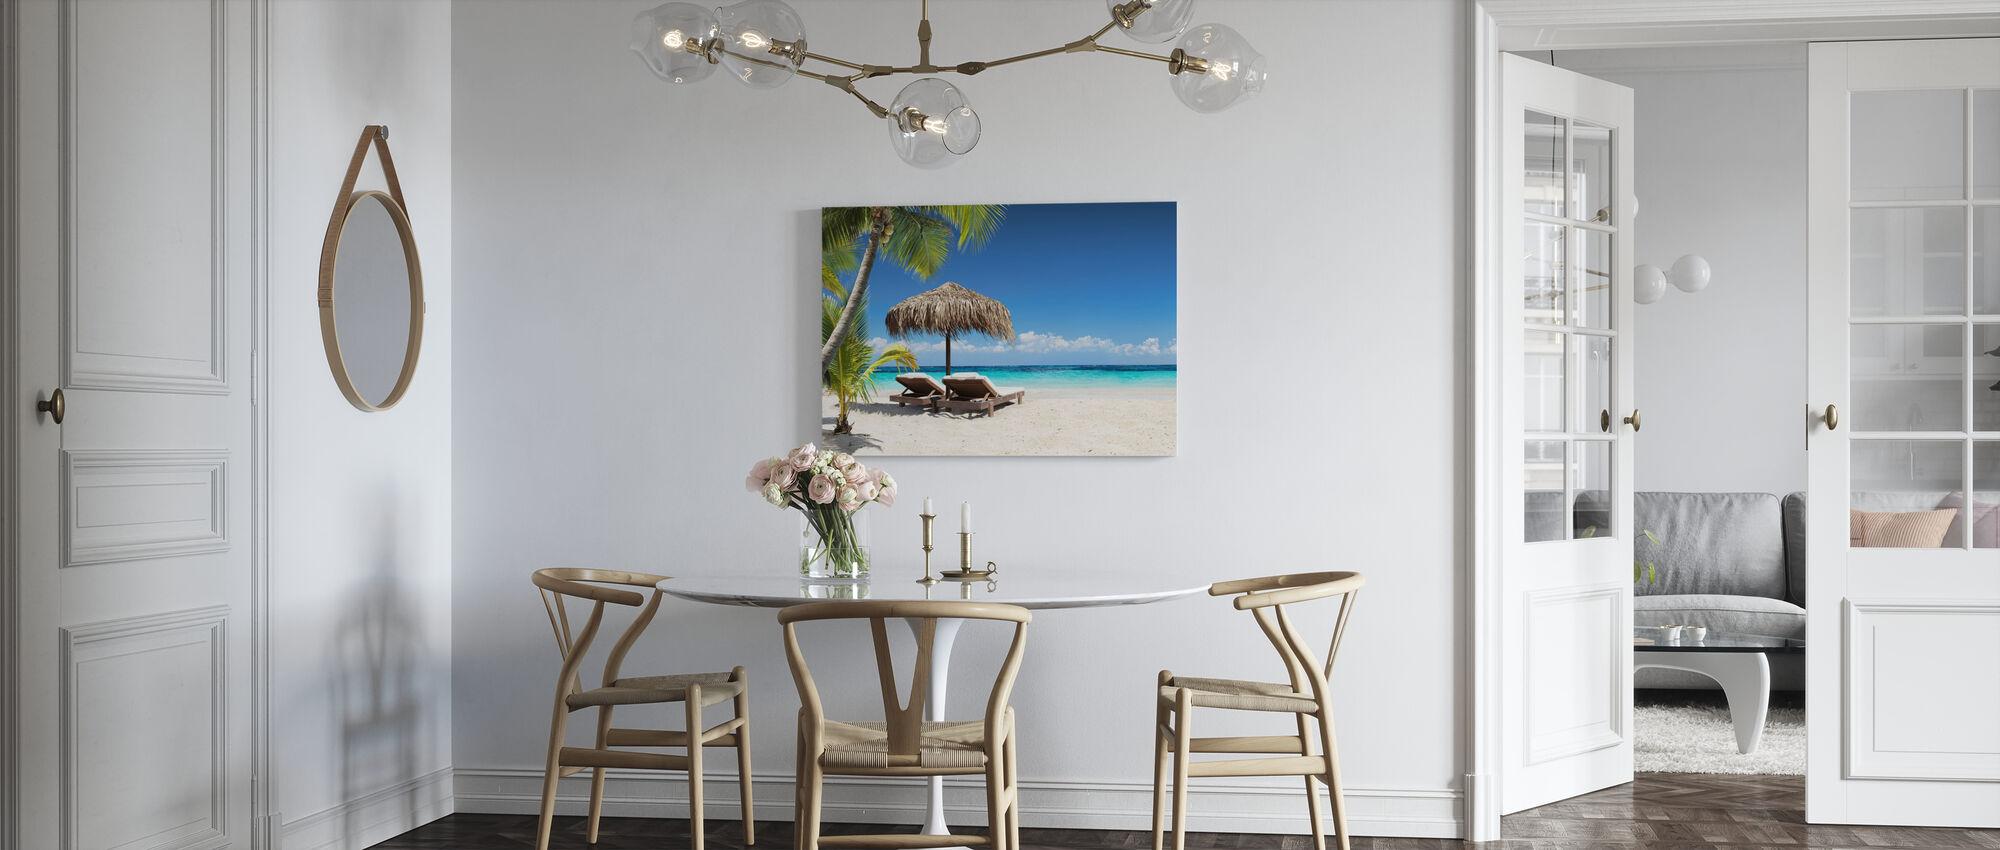 Coral Beach - Canvas print - Kitchen